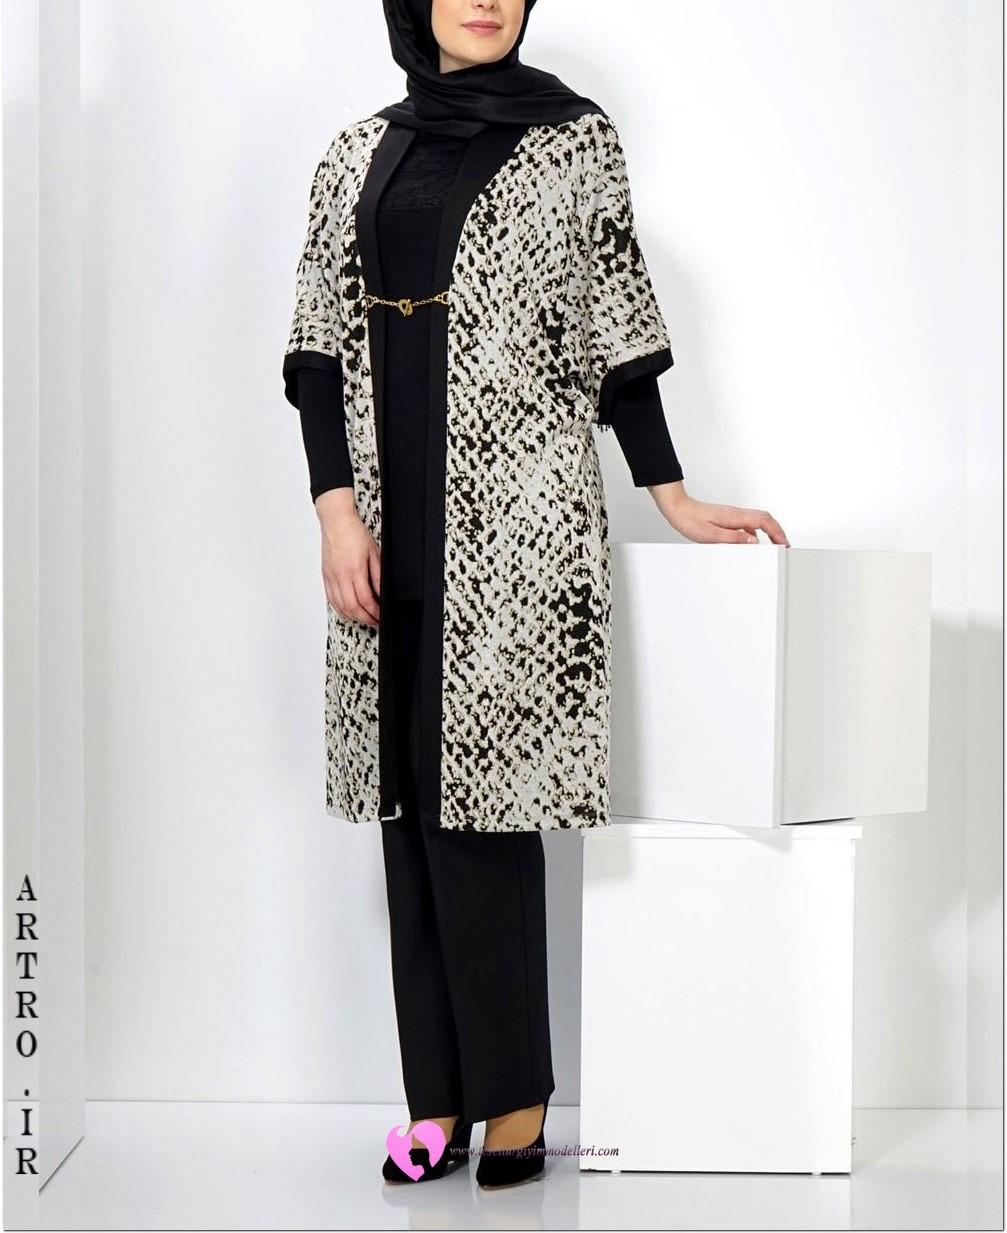 عکس مدل مانتو زنانه سایز بزرگ2018-97